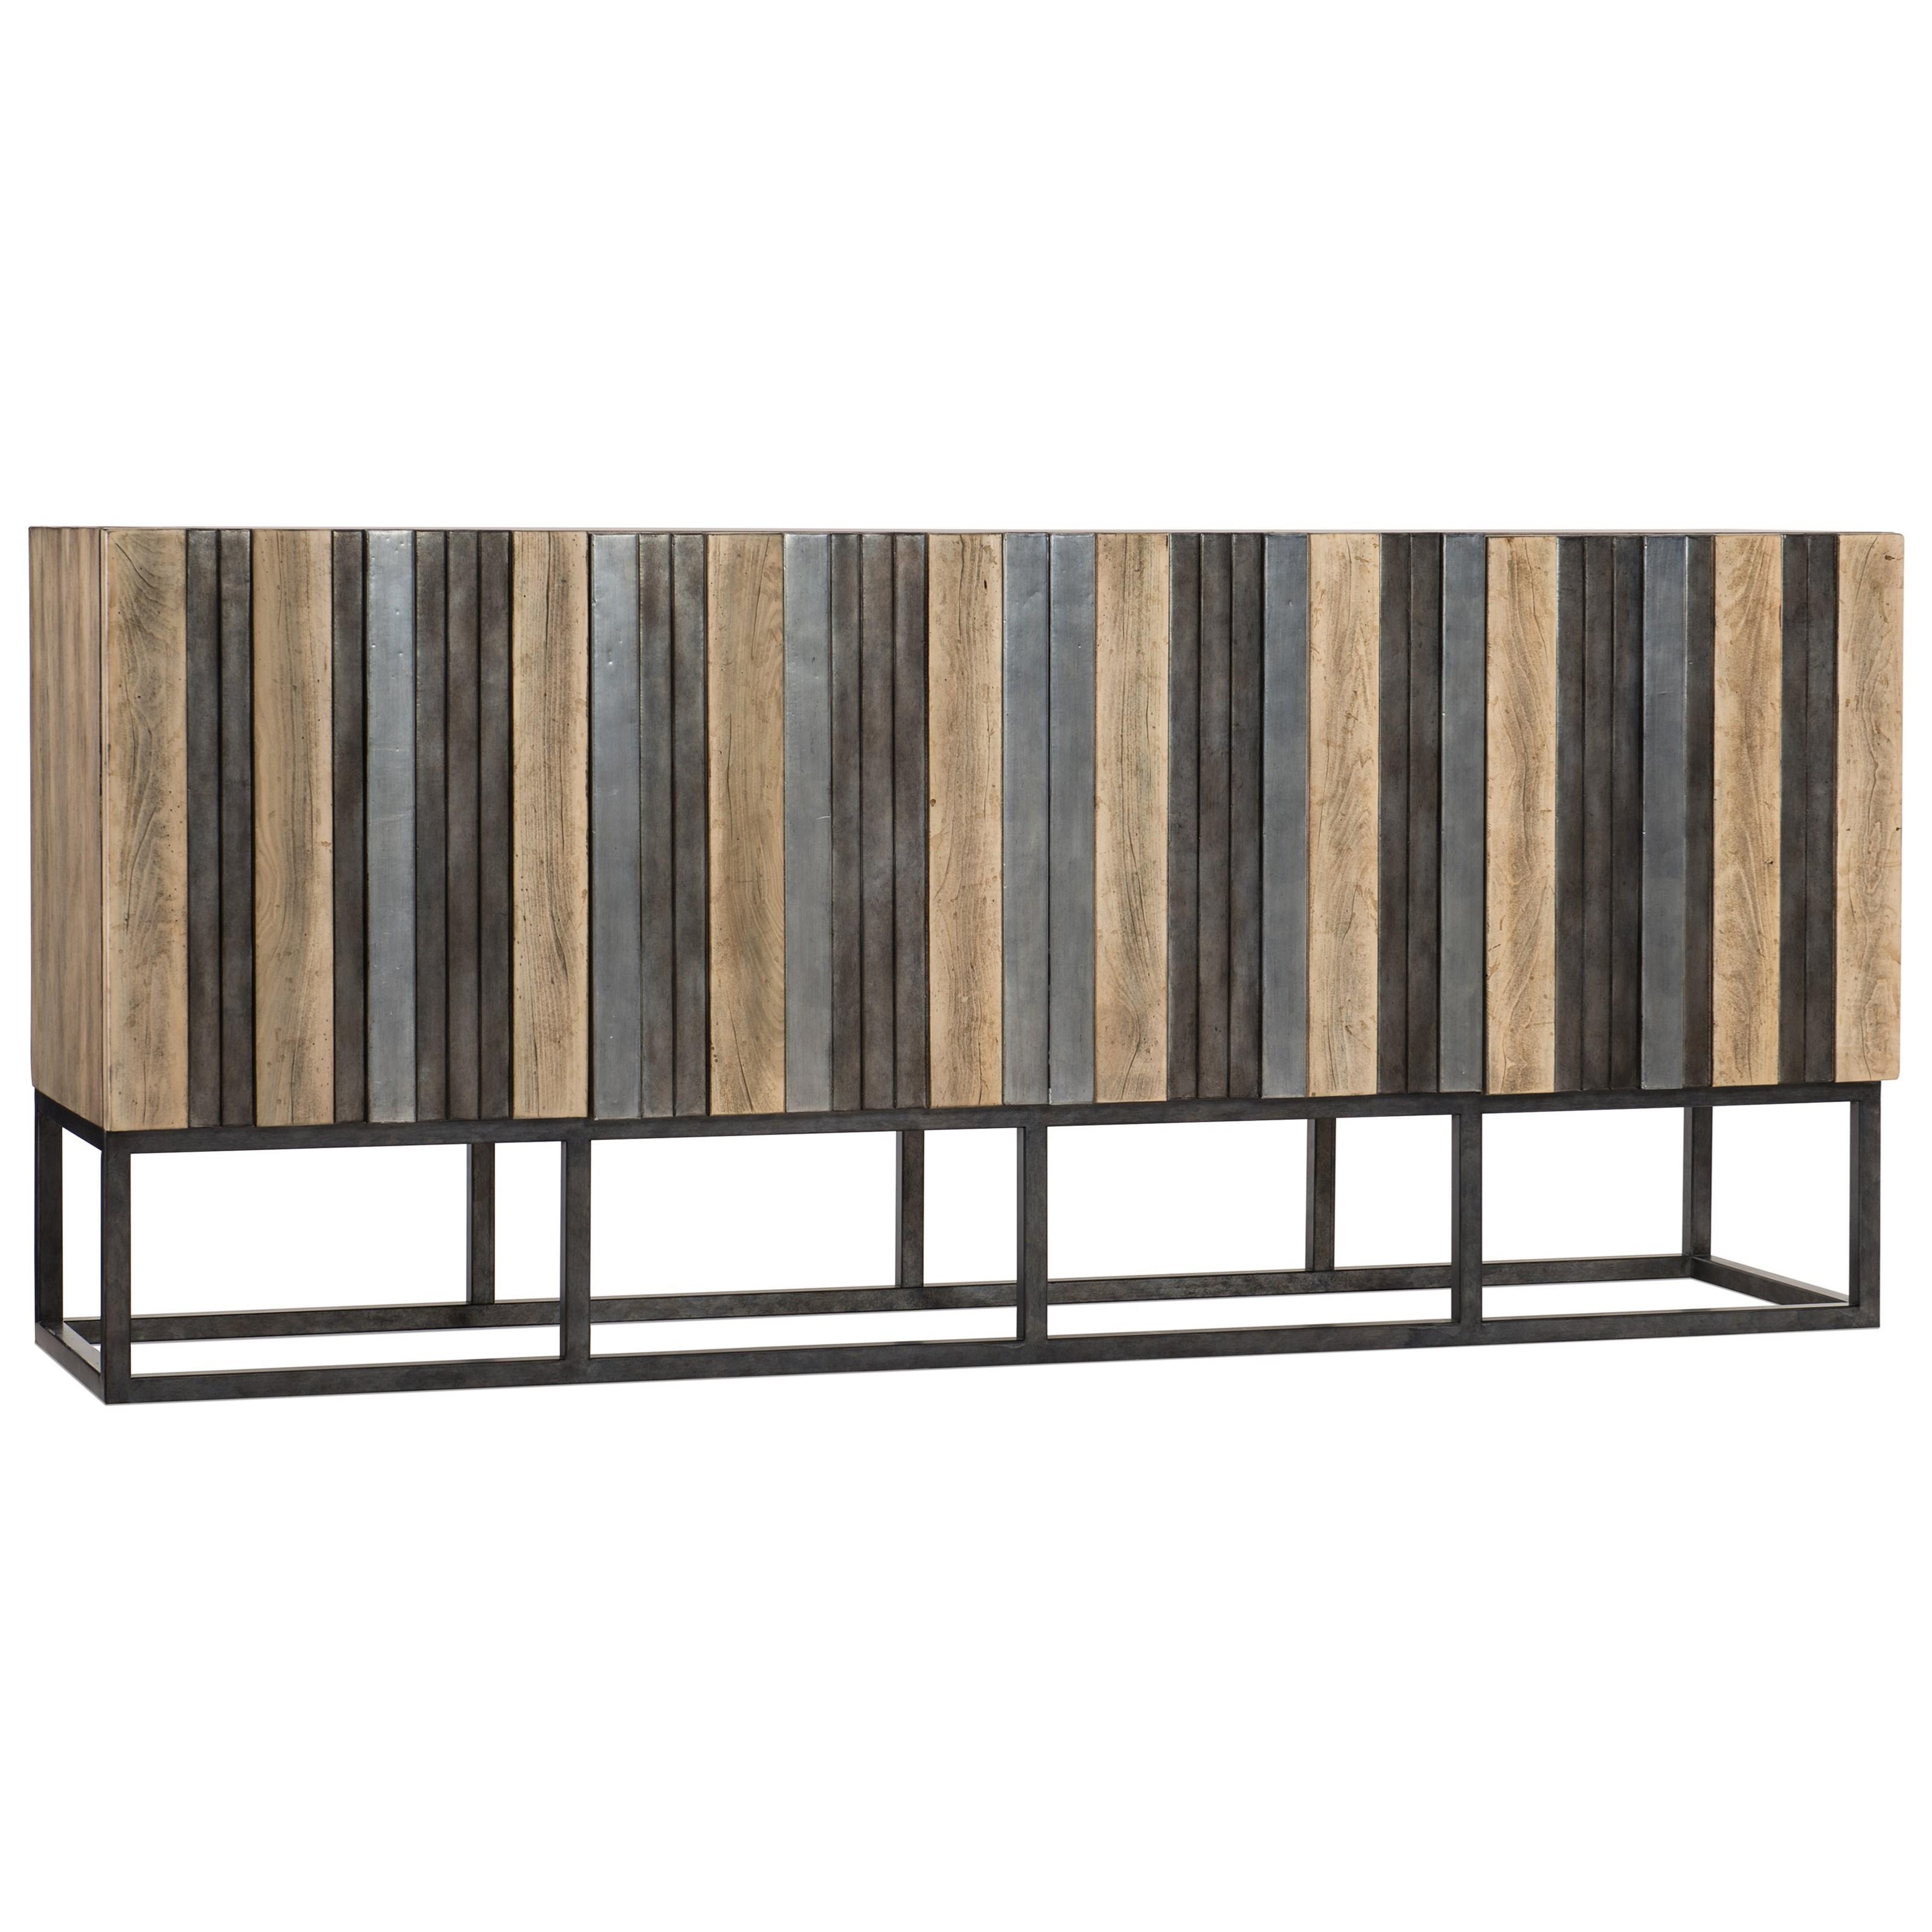 Melange Brady Credenza by Hooker Furniture at Stoney Creek Furniture